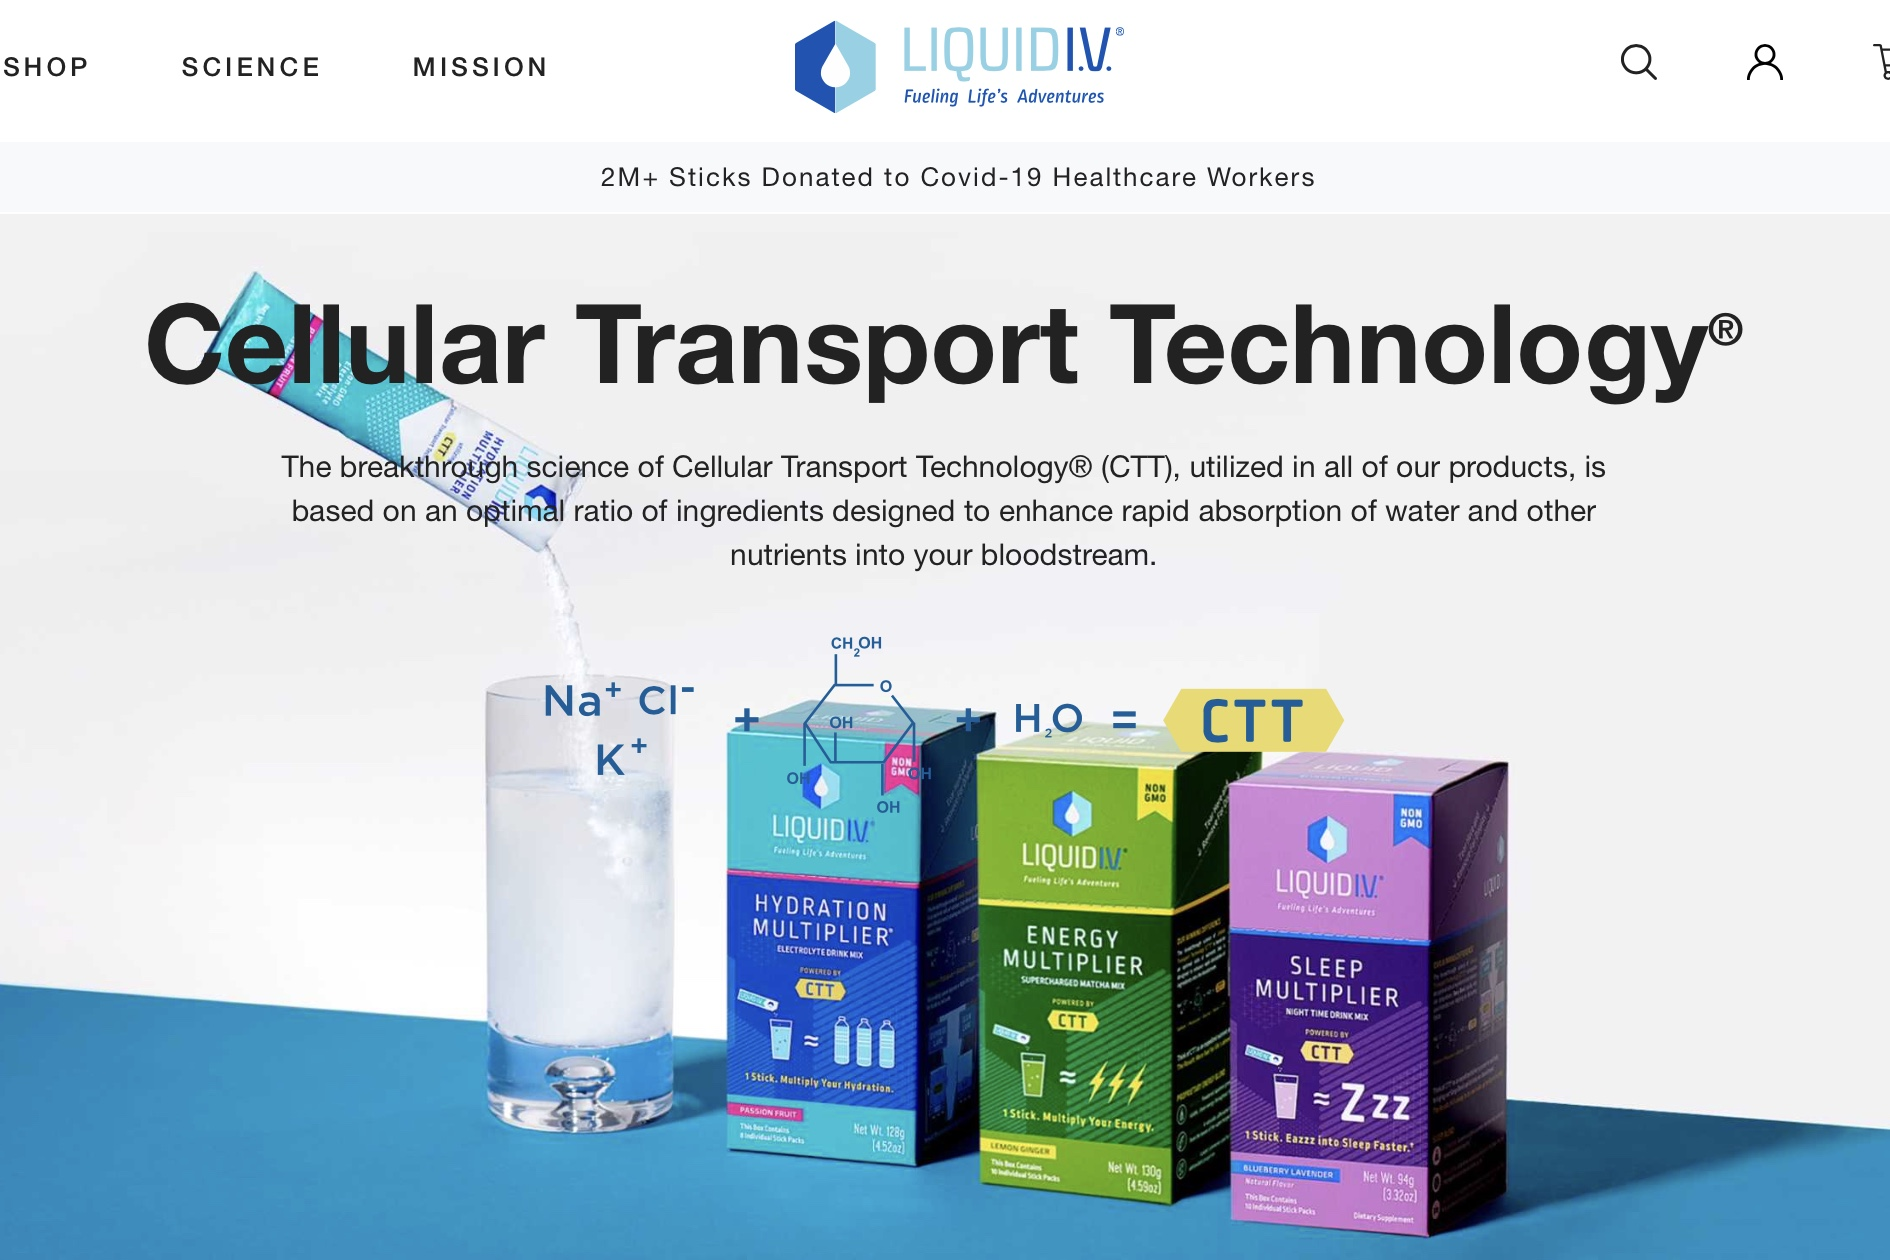 联合利华收购美国电解质饮料新锐品牌 Liquid I.V.